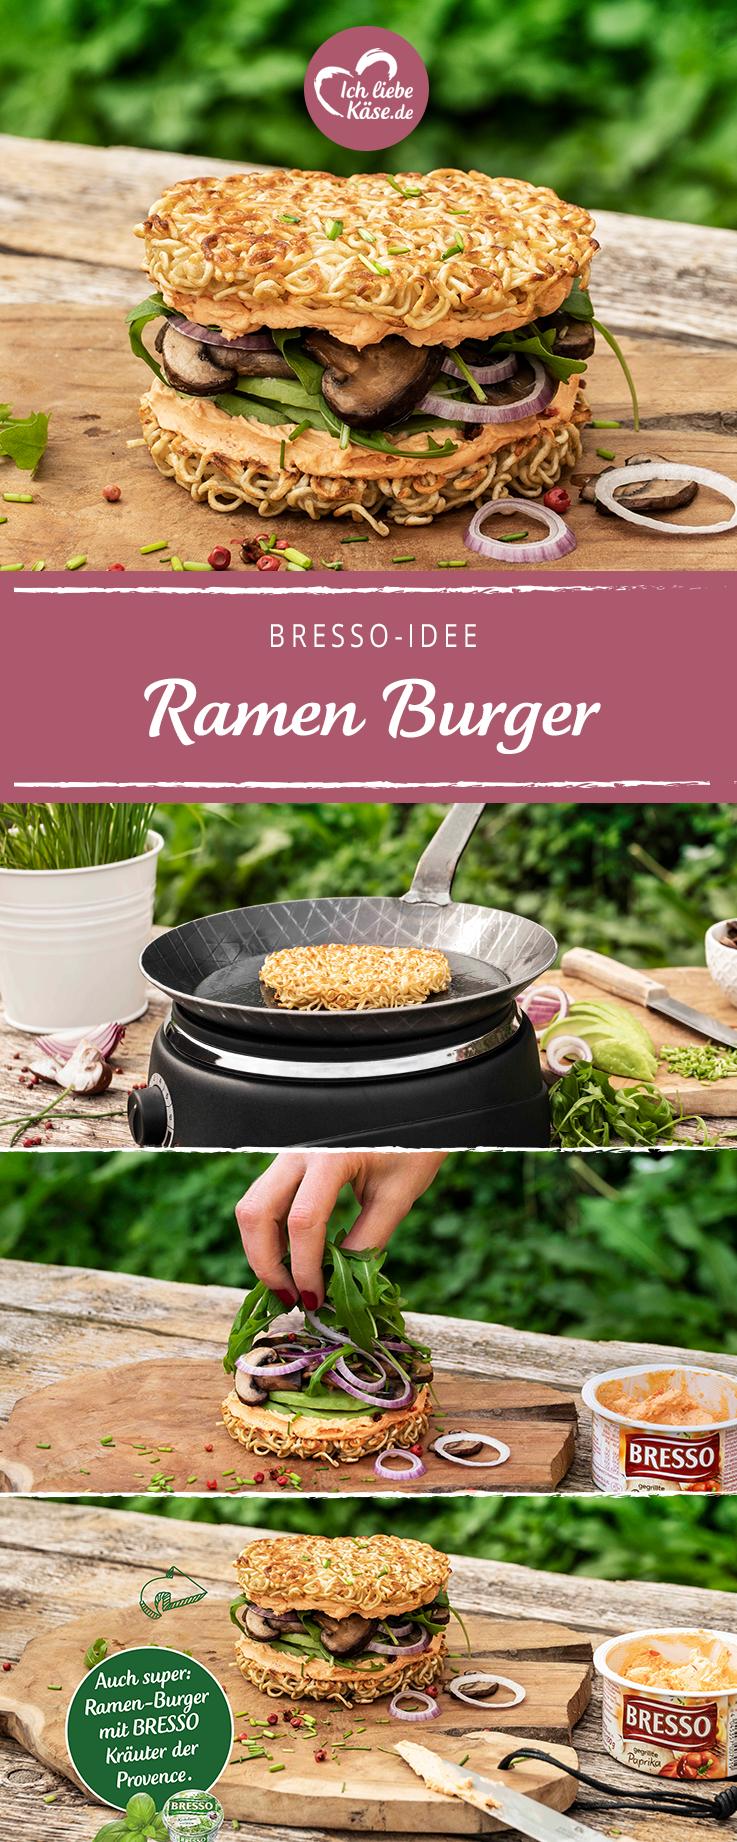 Ramen-Burger #recettesympa